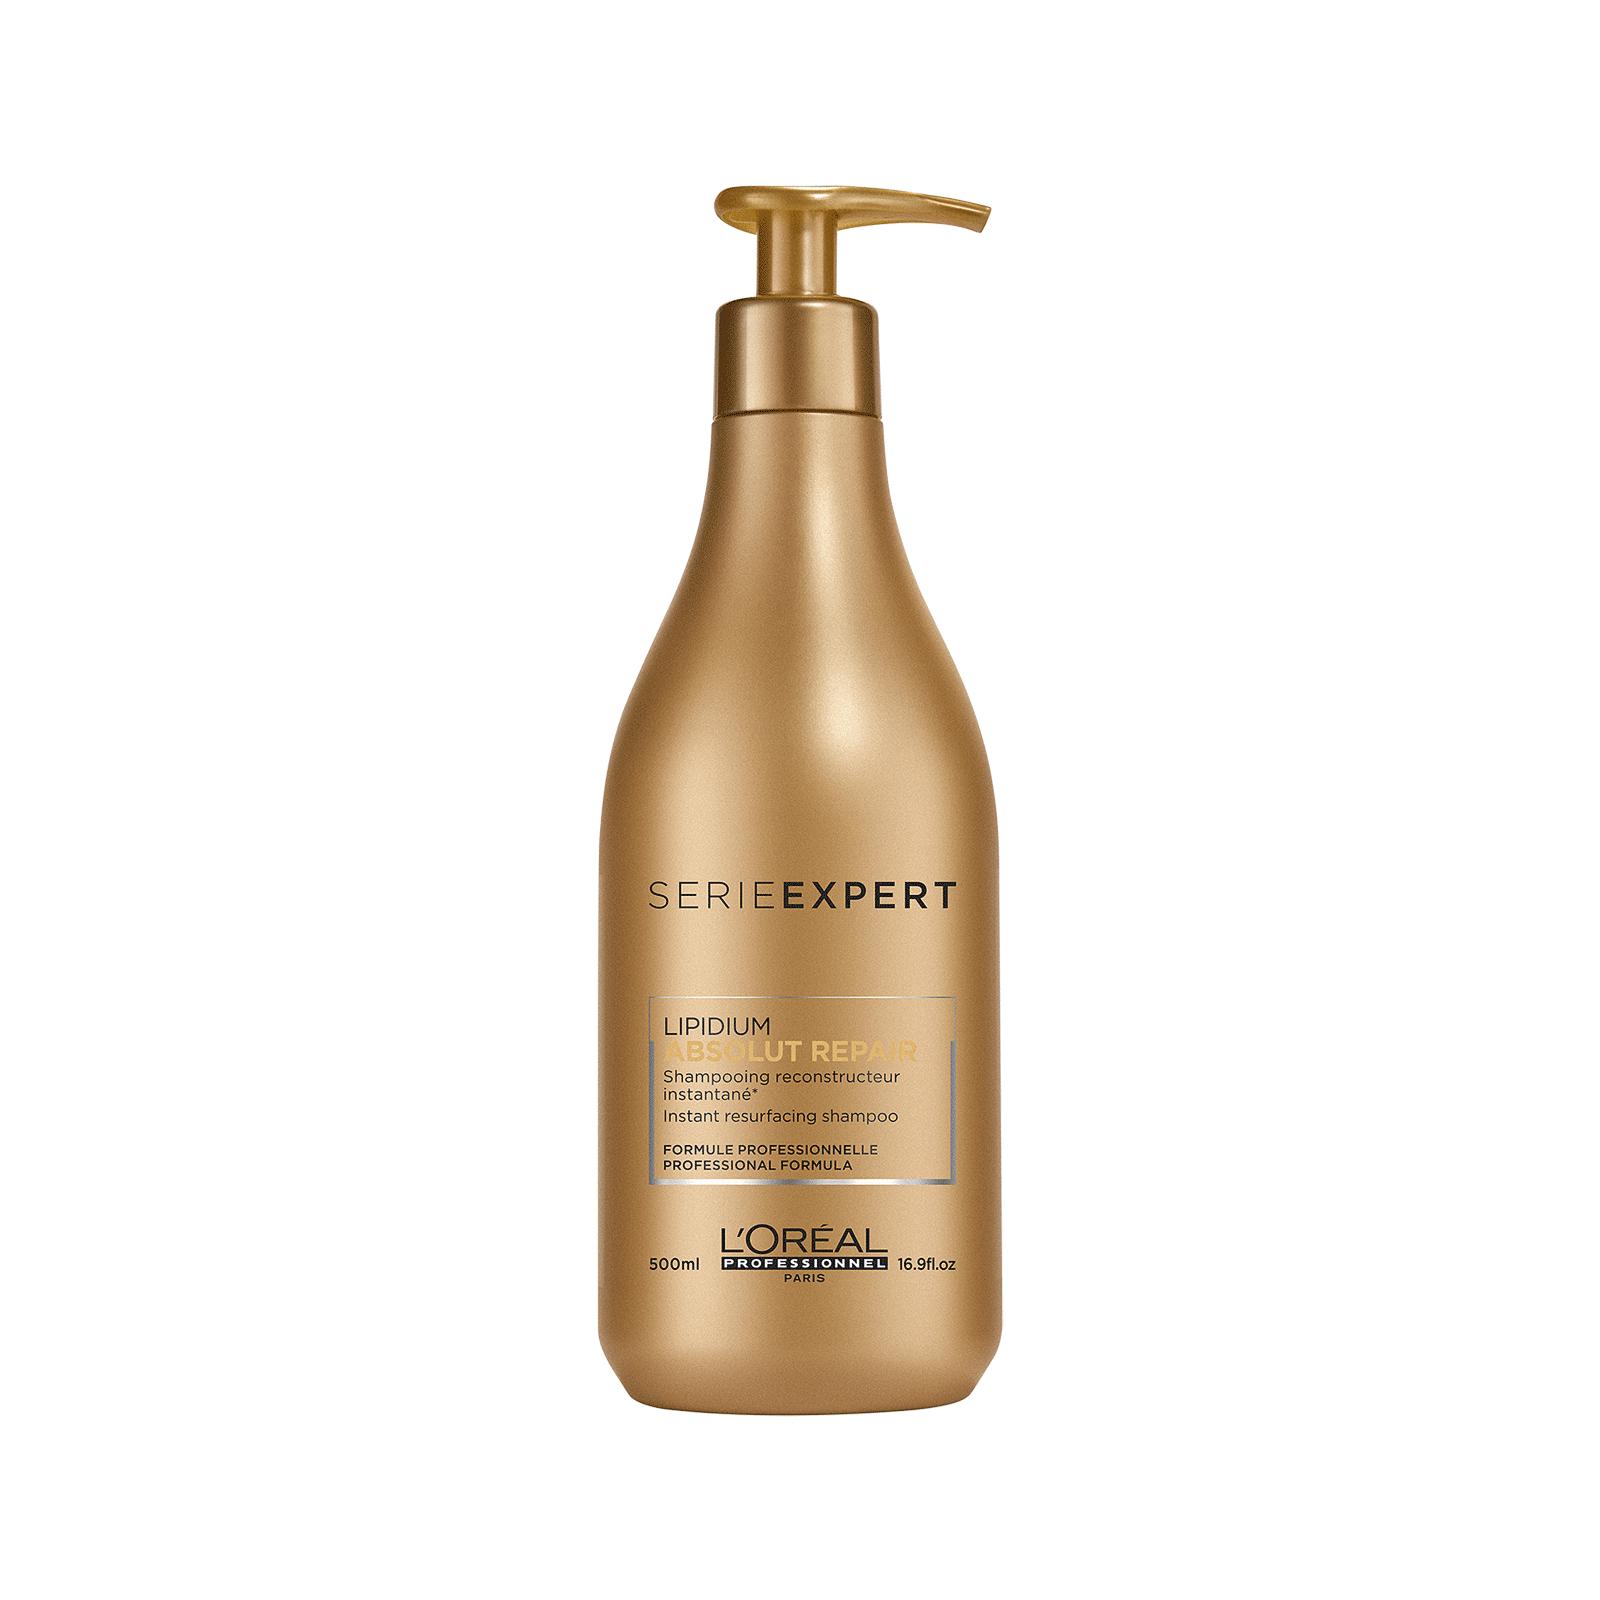 Serie Expert - Absolut Repair Lipidium Shampoo - L Oreal ... a23c829f1b